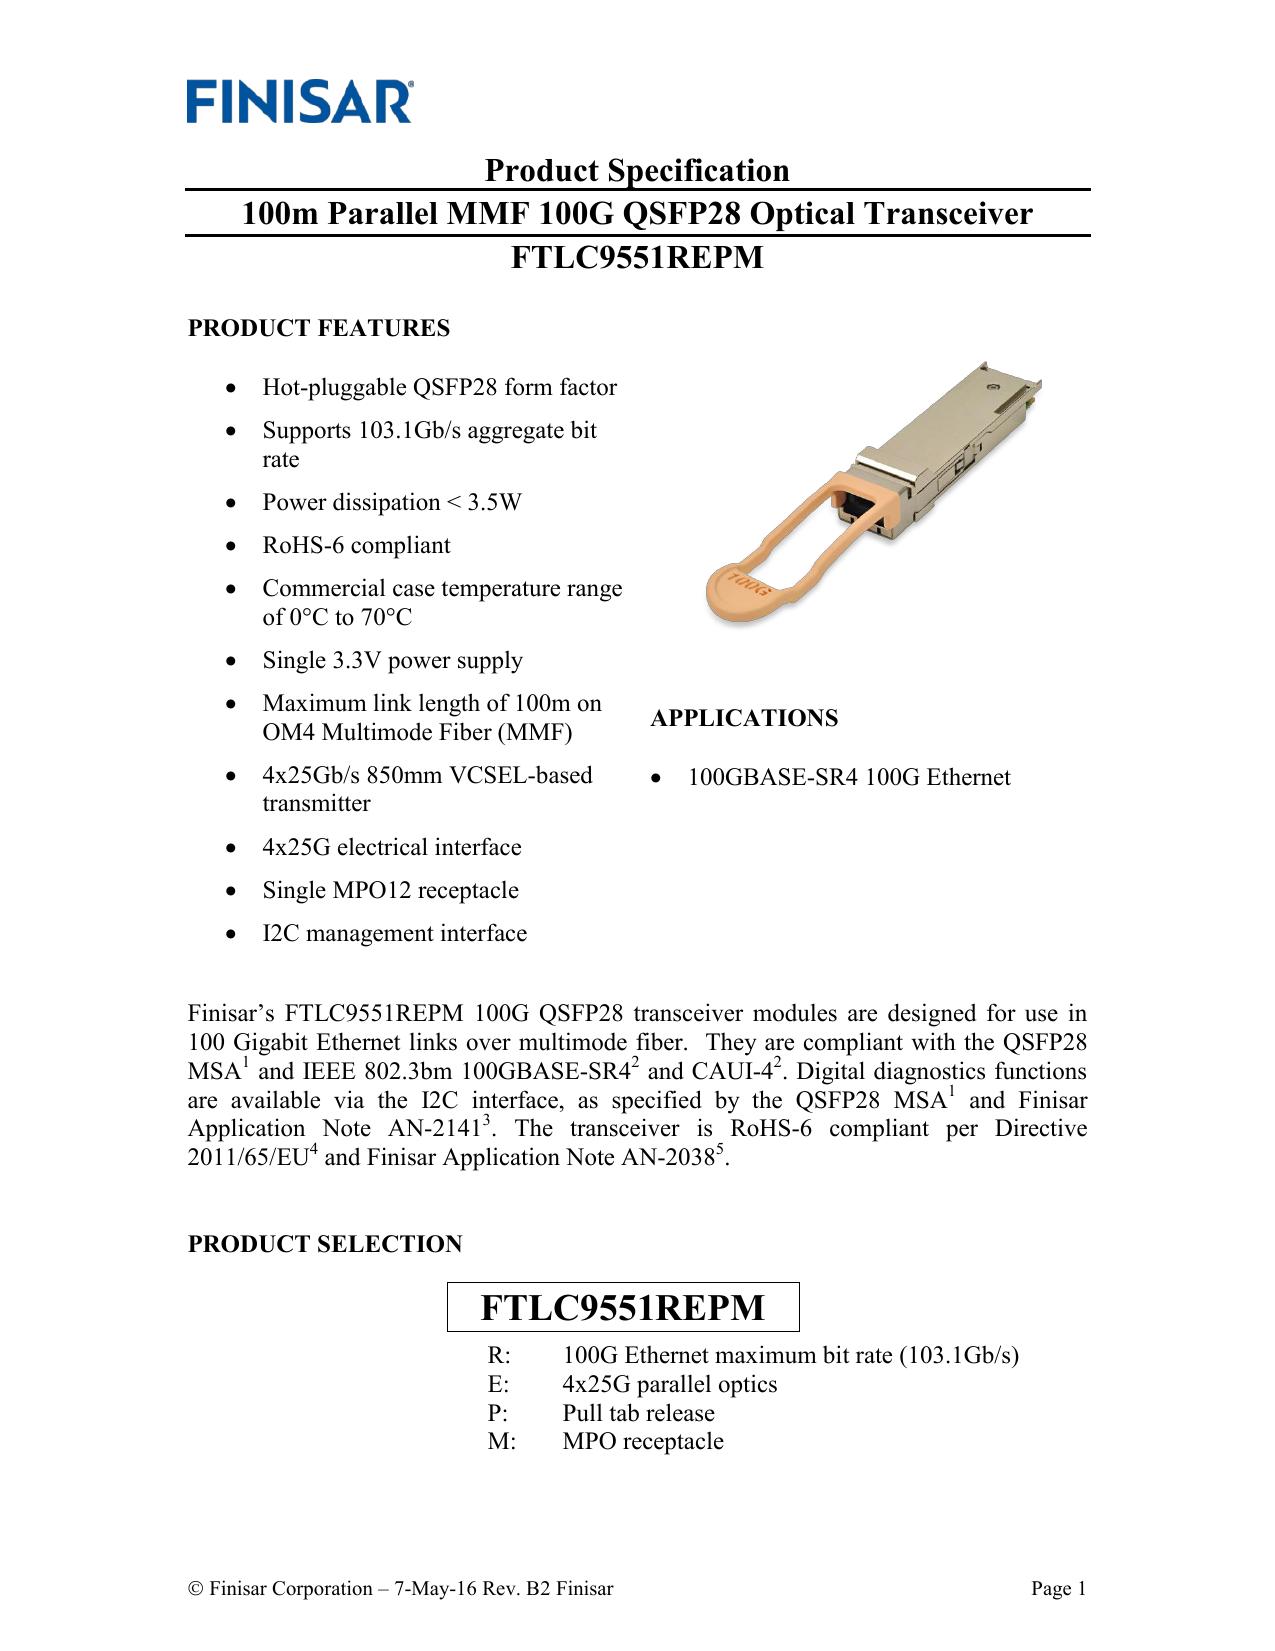 Finisar FTLC9551REPM 100GBASE   manualzz com